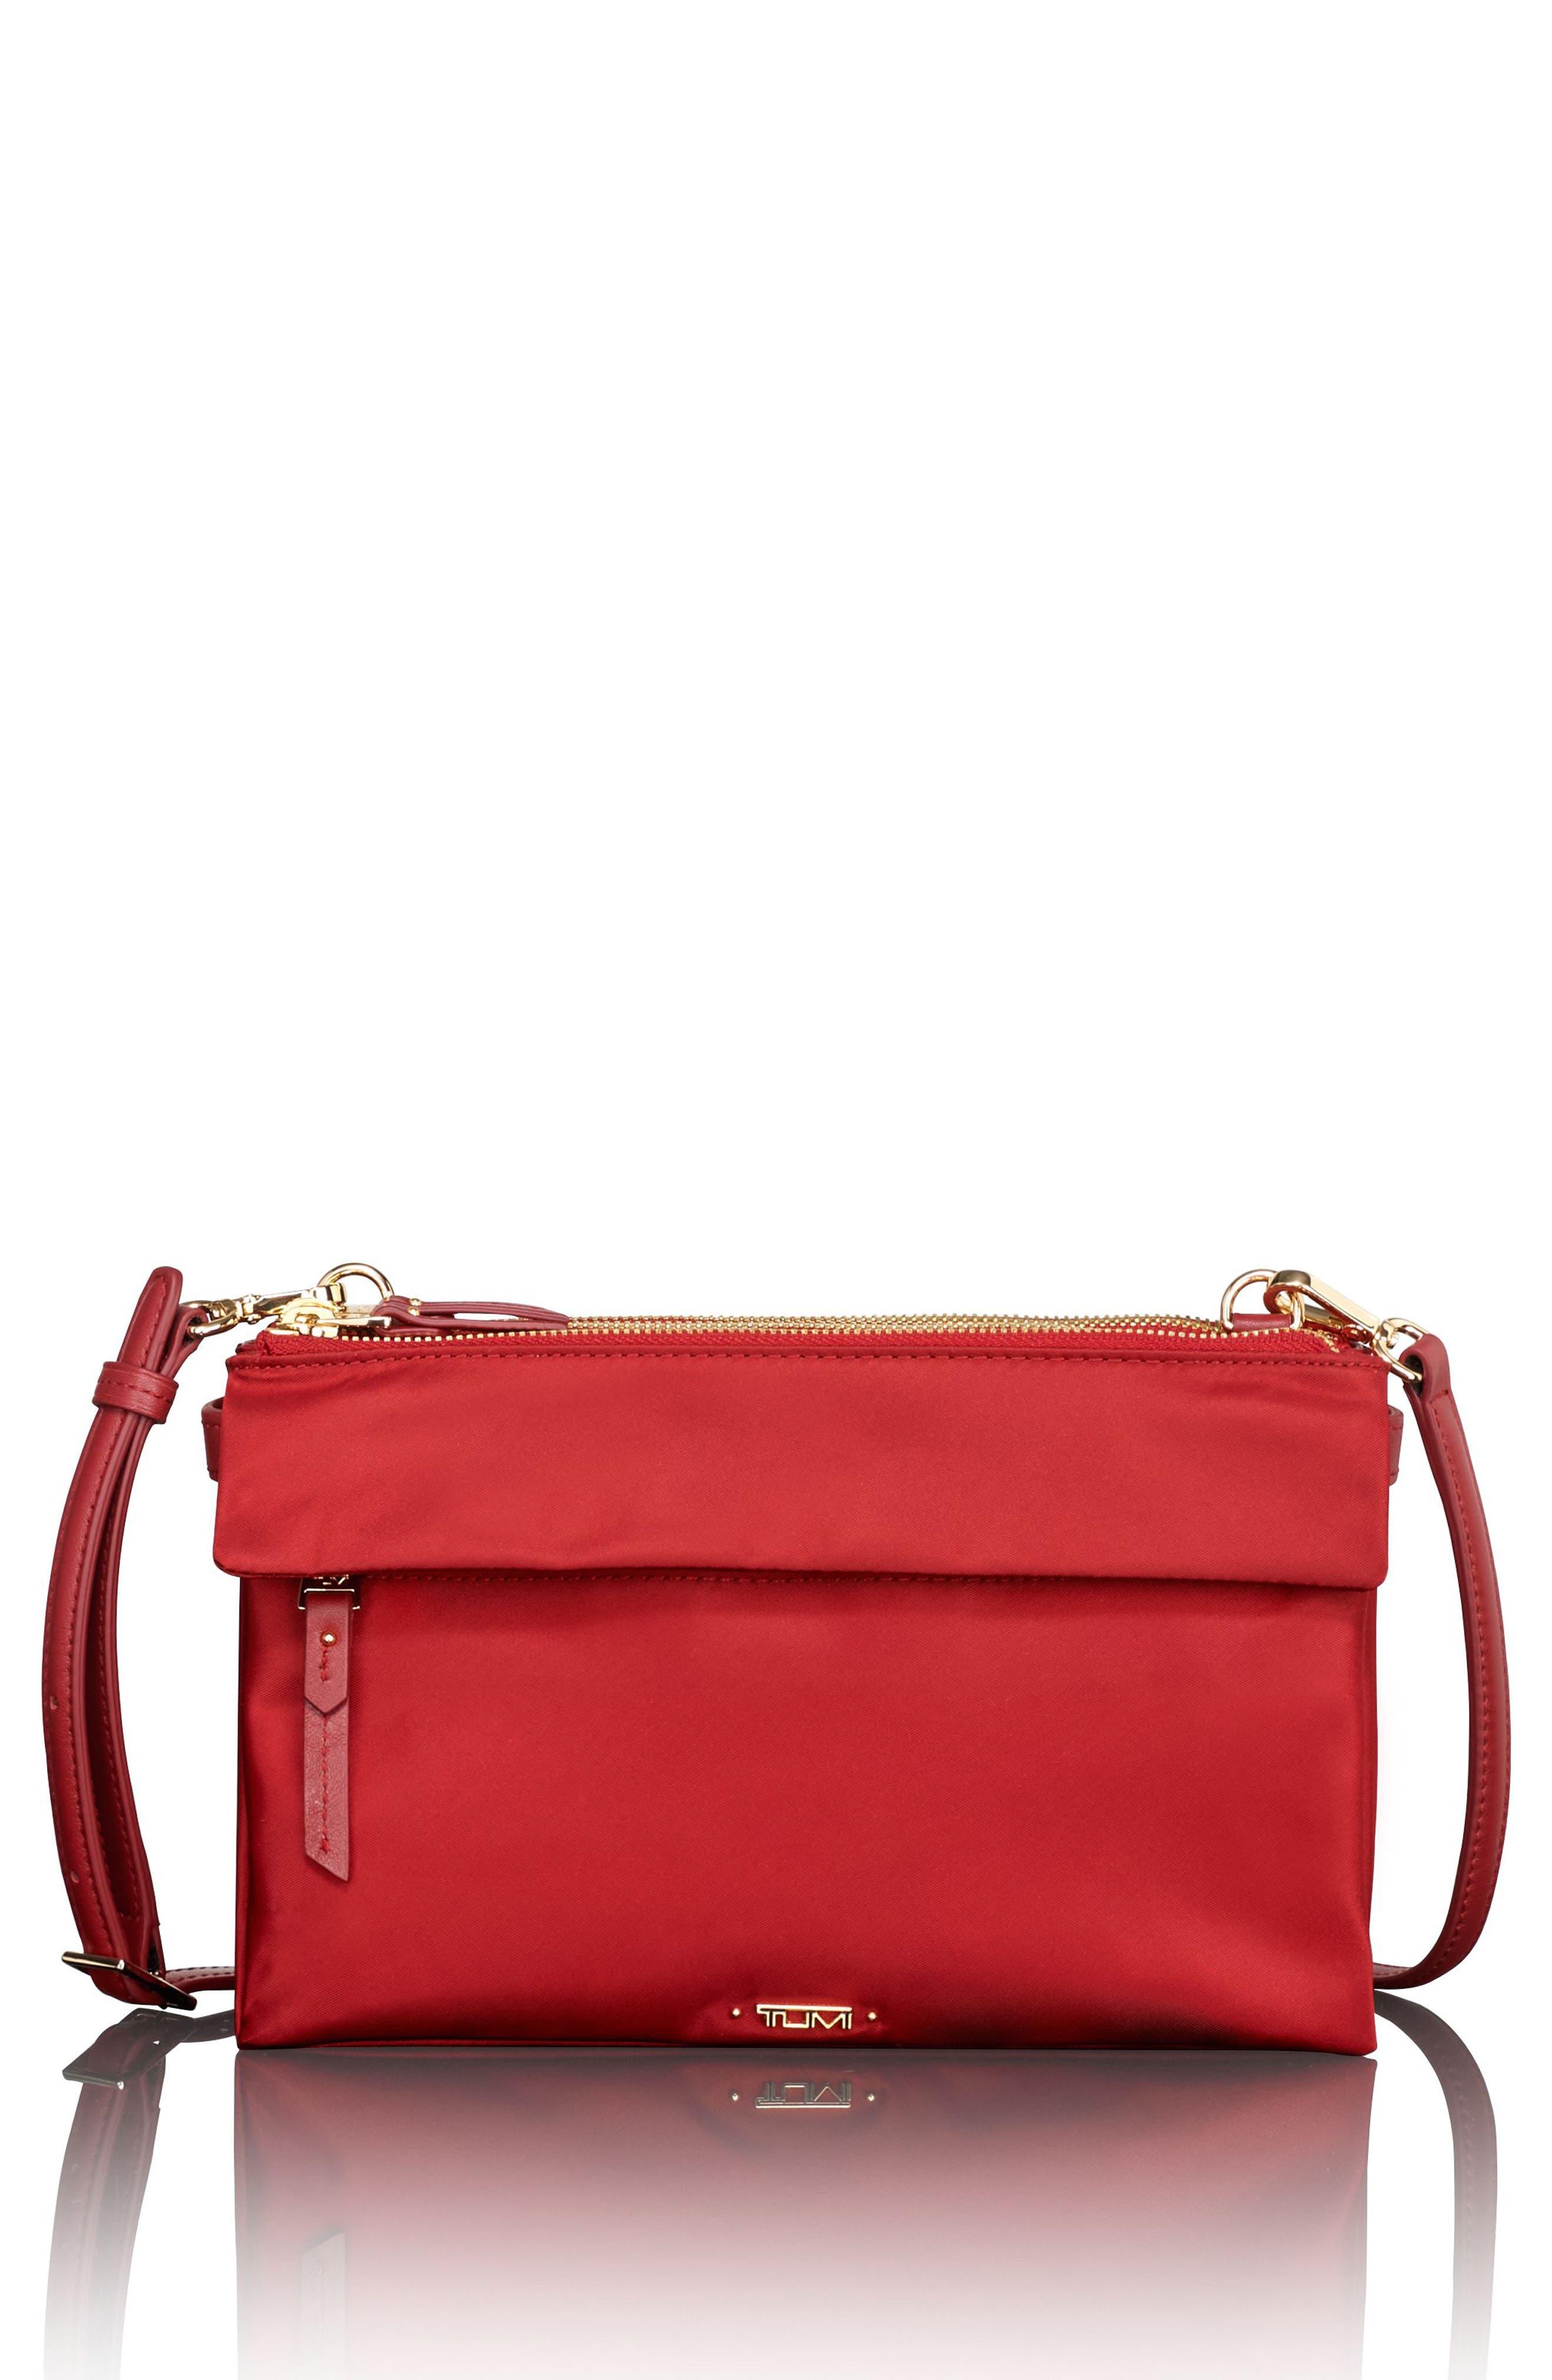 Tumi Voyageur - Tristen Nylon Crossbody Bag